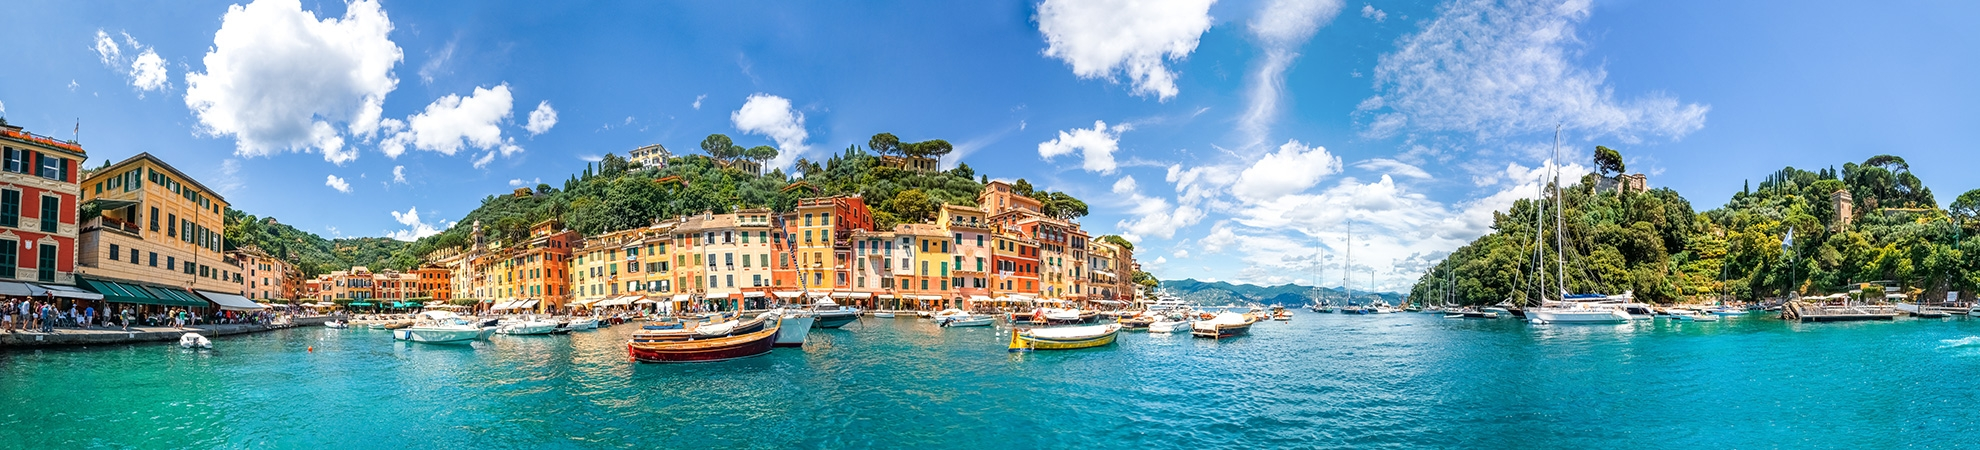 Voyage Portofino